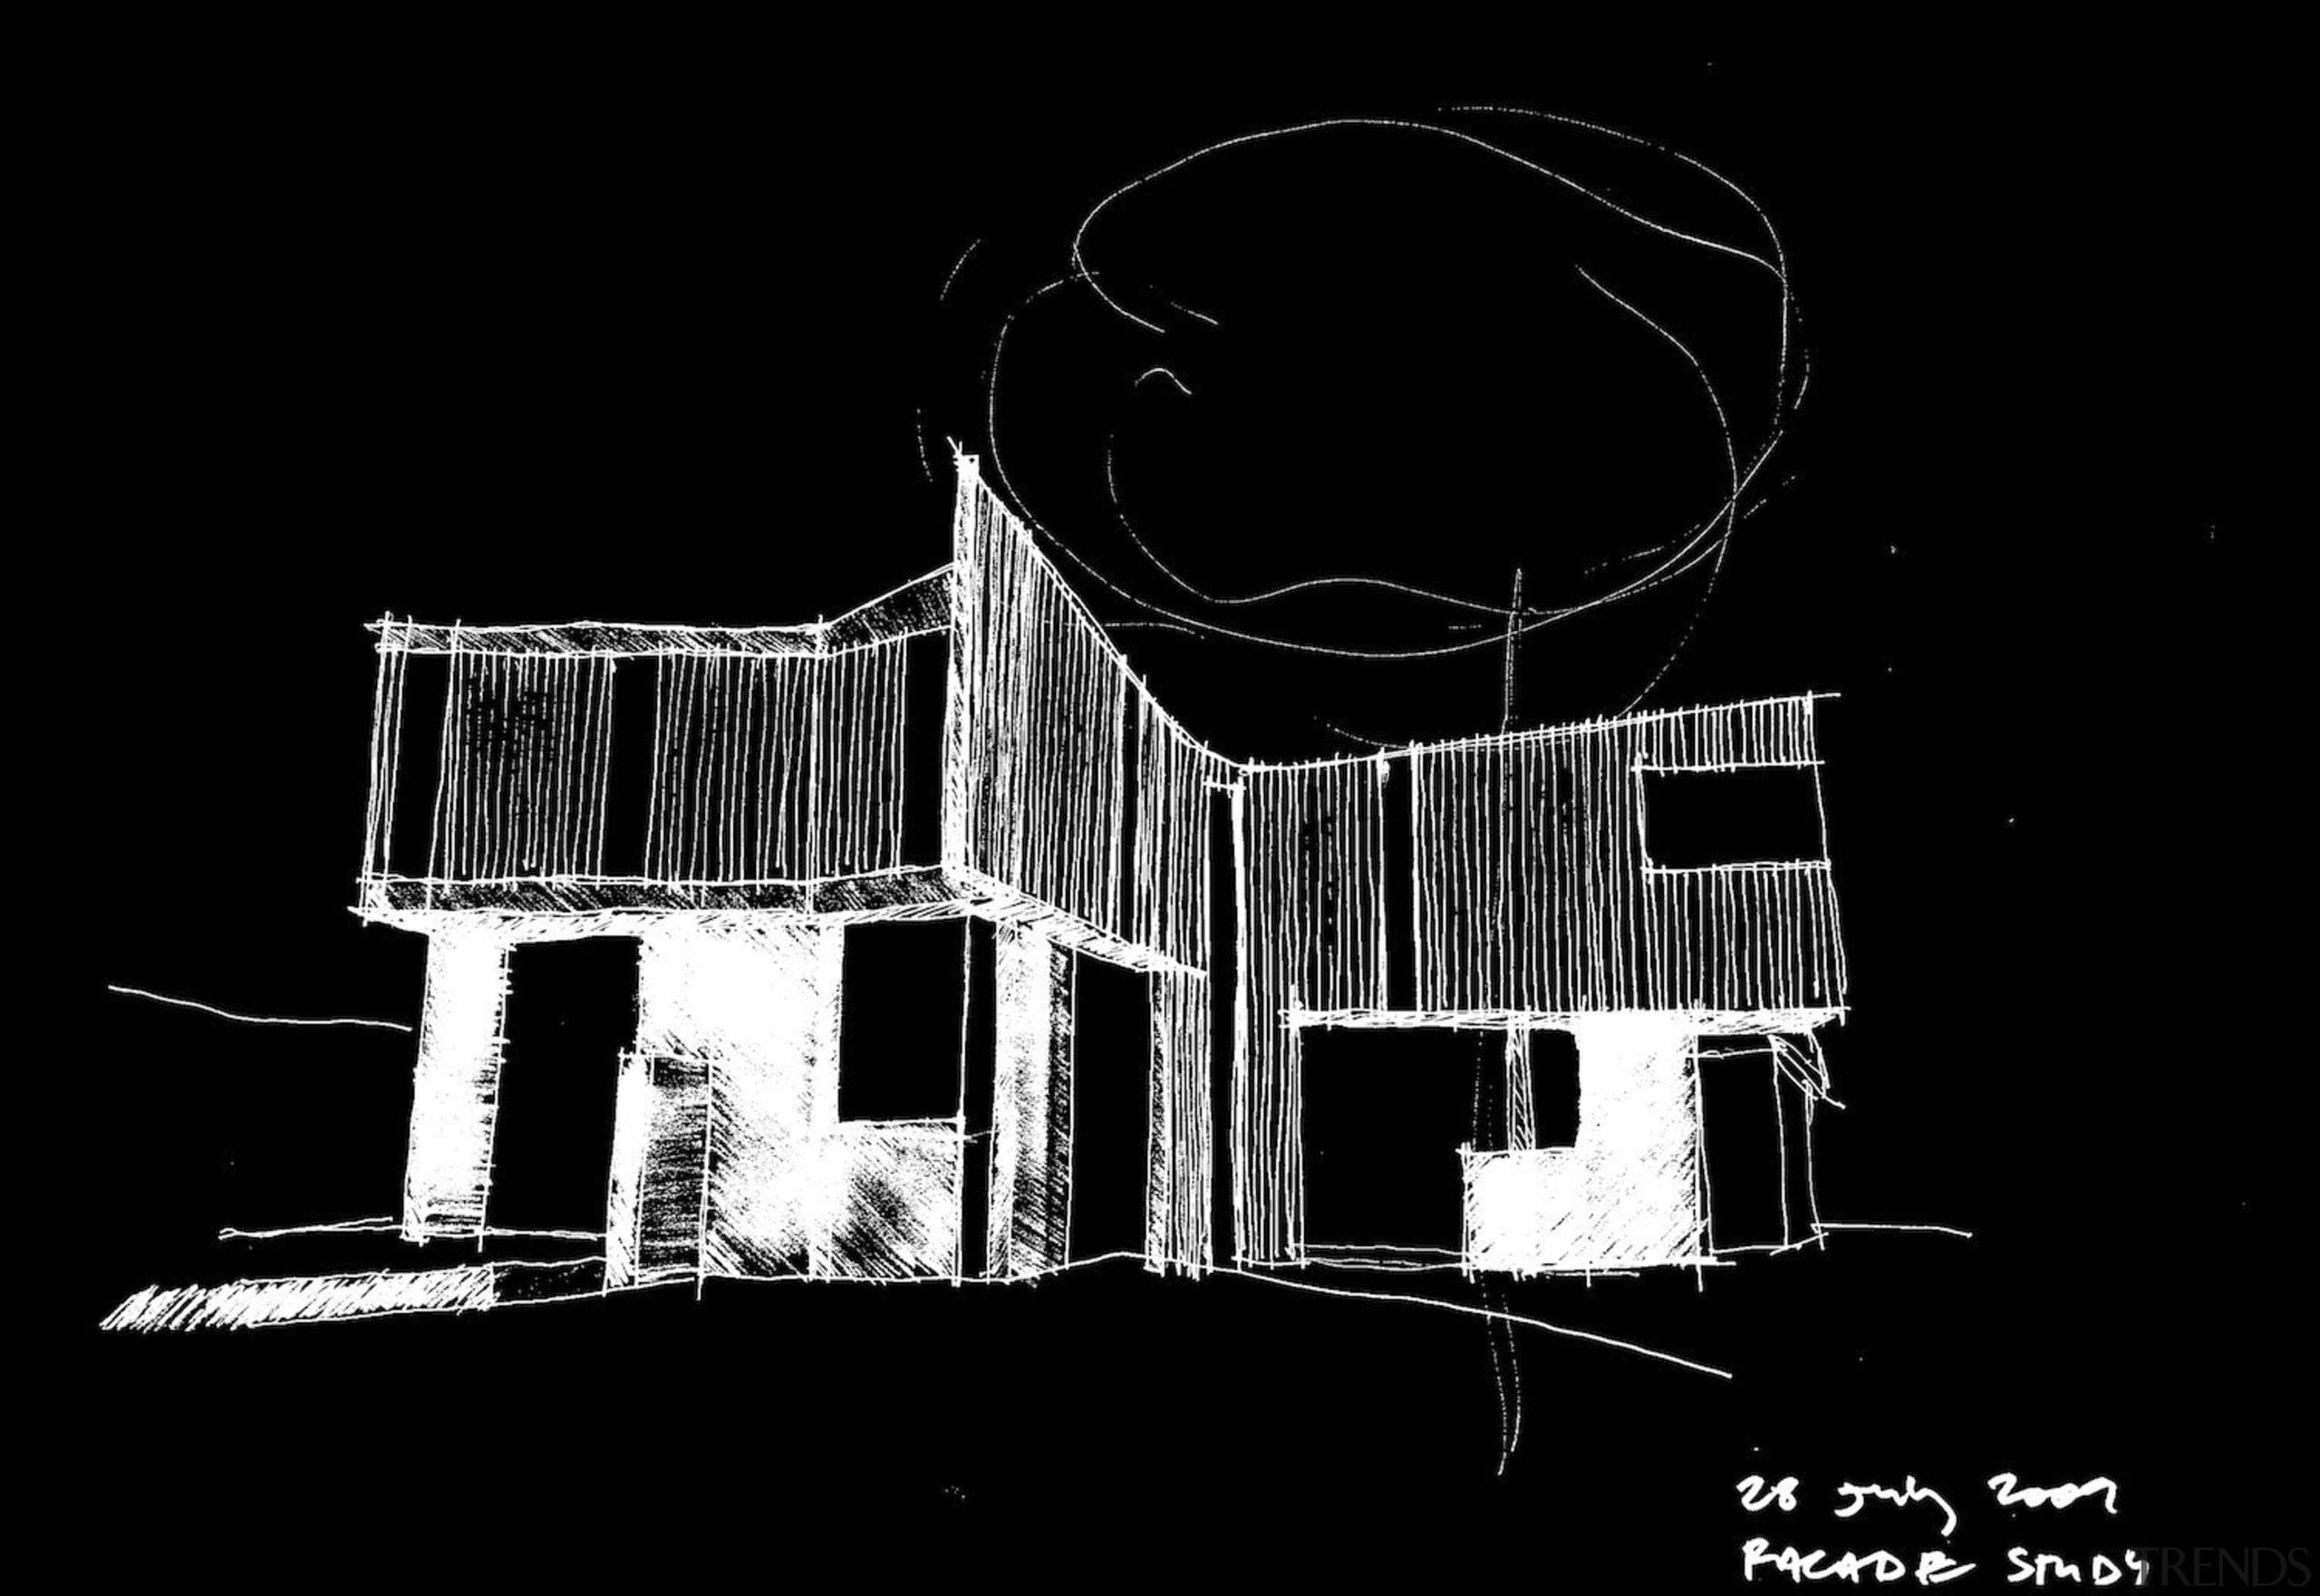 Architect: Steffen Welsch ArchitectsPhotography: Rhiannon Slatter architecture, black, black and white, darkness, design, font, monochrome, monochrome photography, night, structure, black